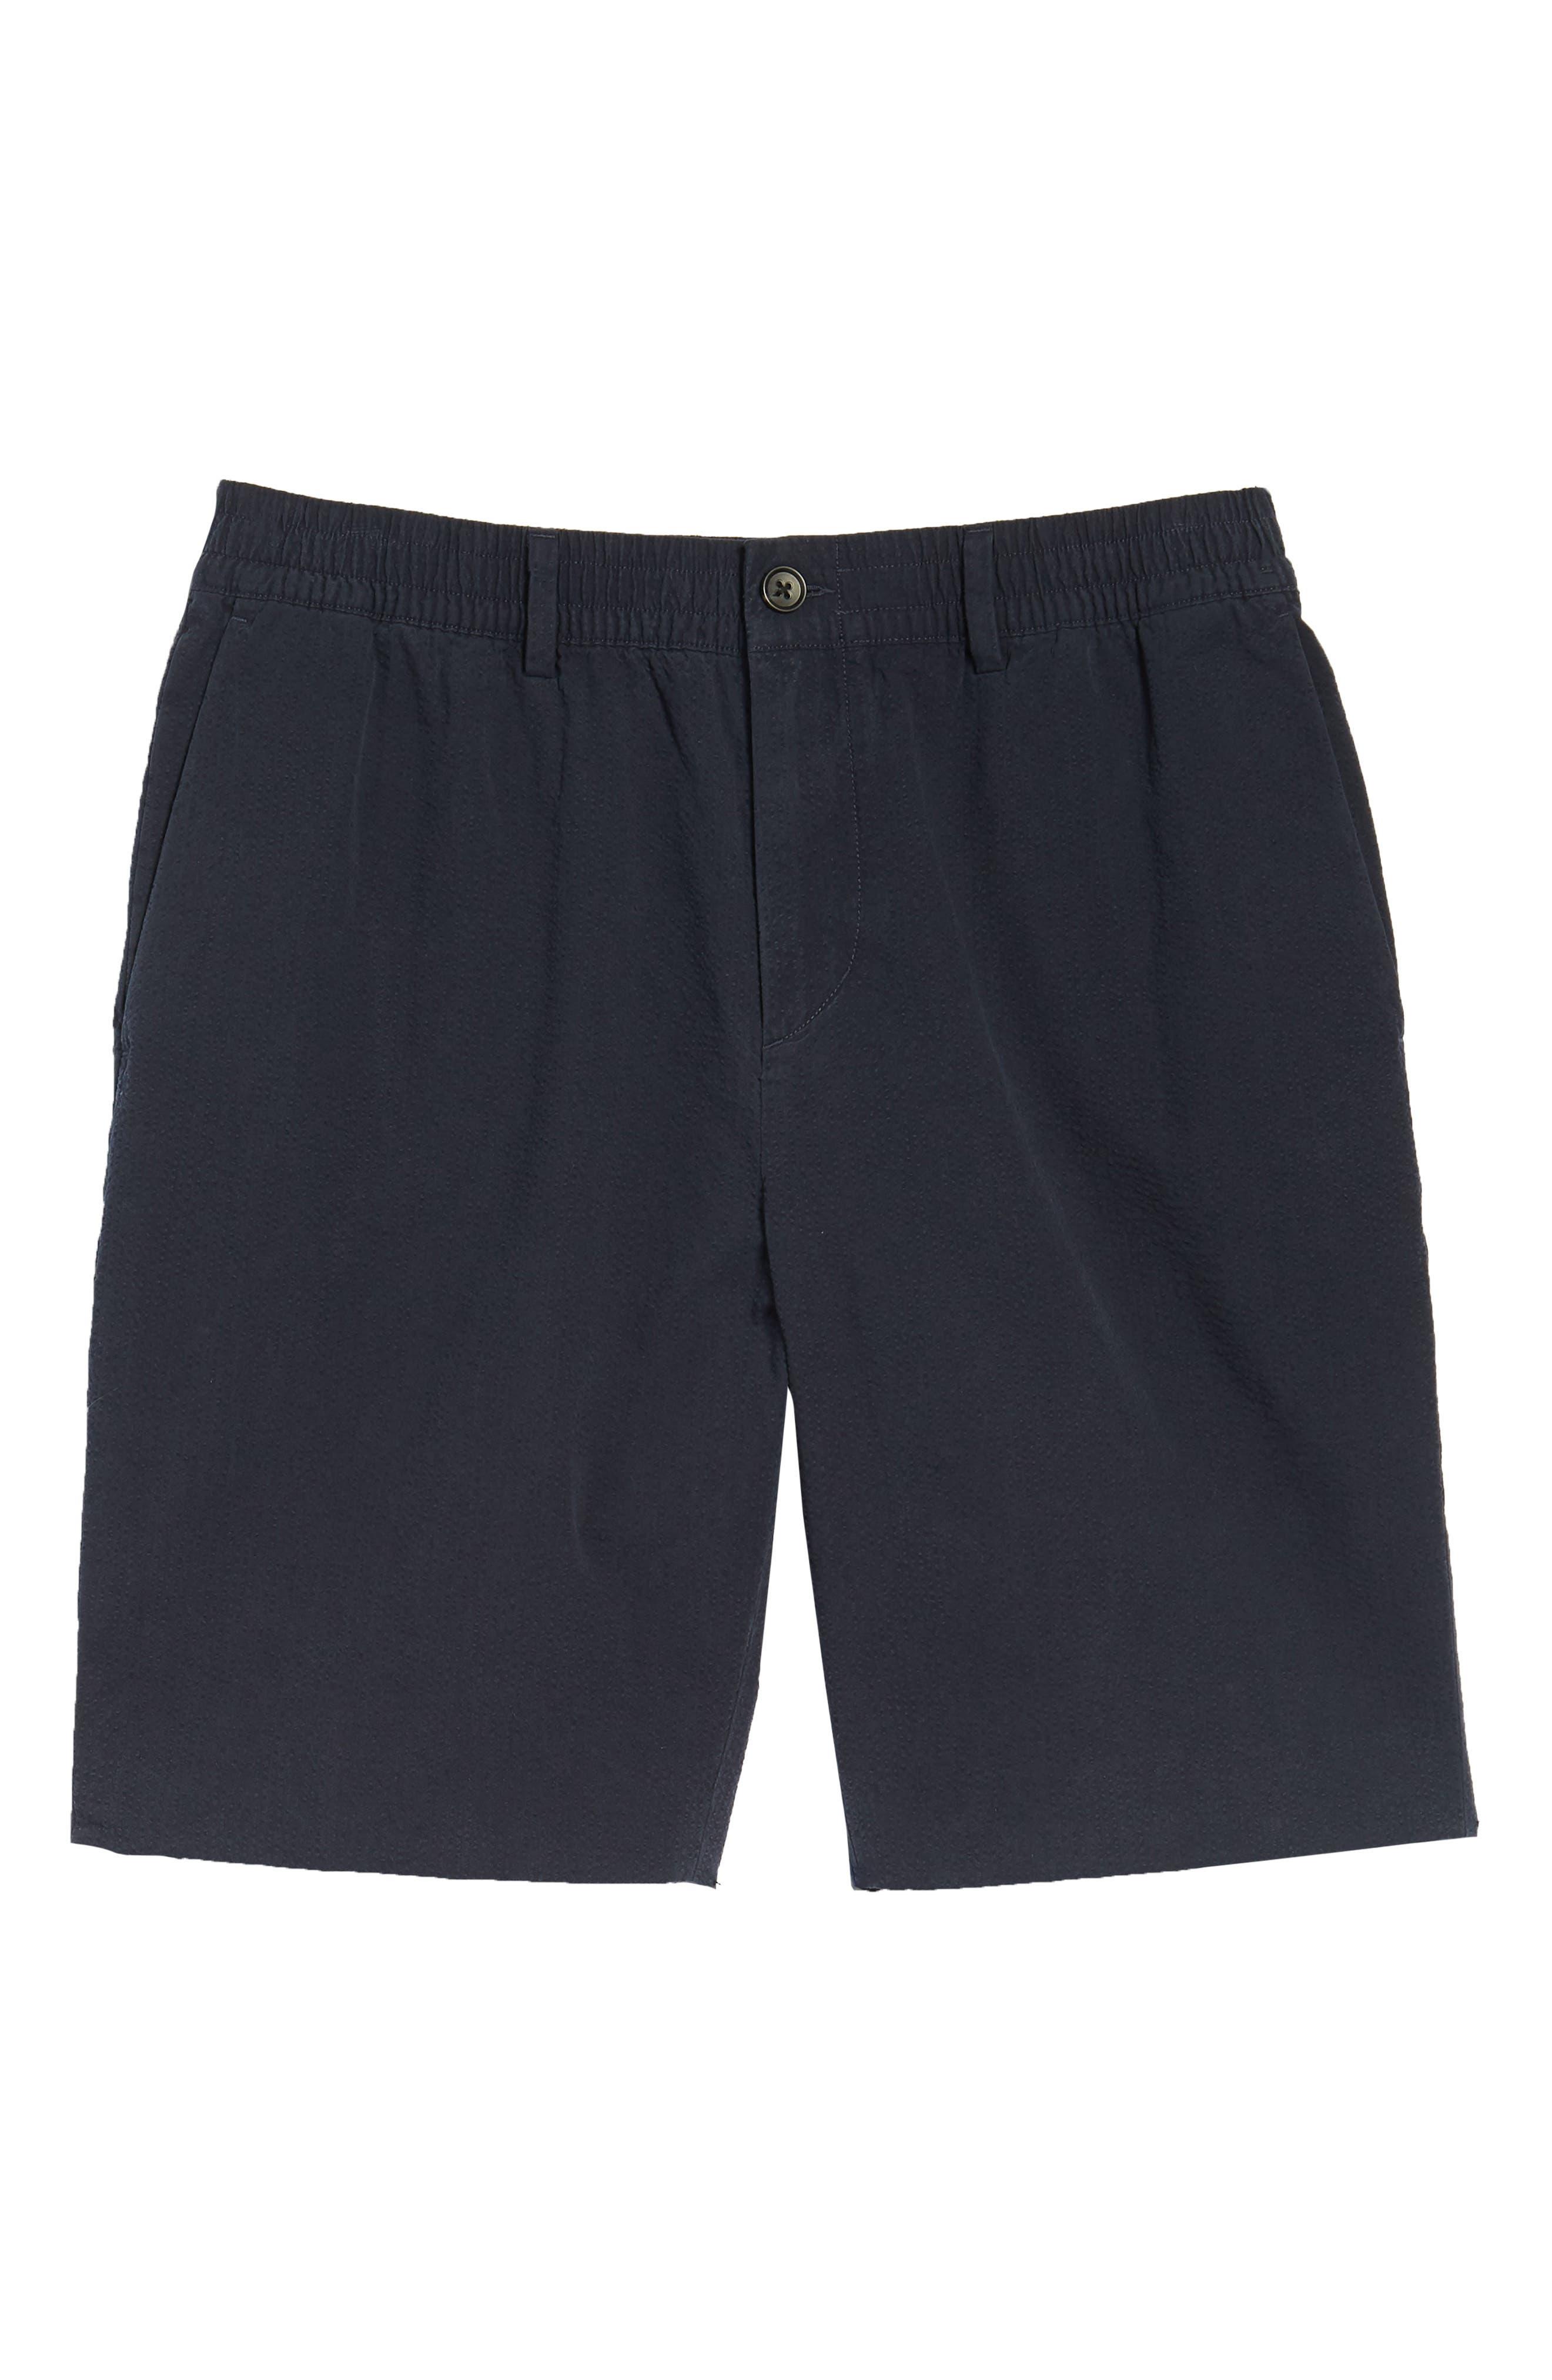 Elastic Waist Seersucker Shorts,                             Alternate thumbnail 6, color,                             Navy Night Seersucker